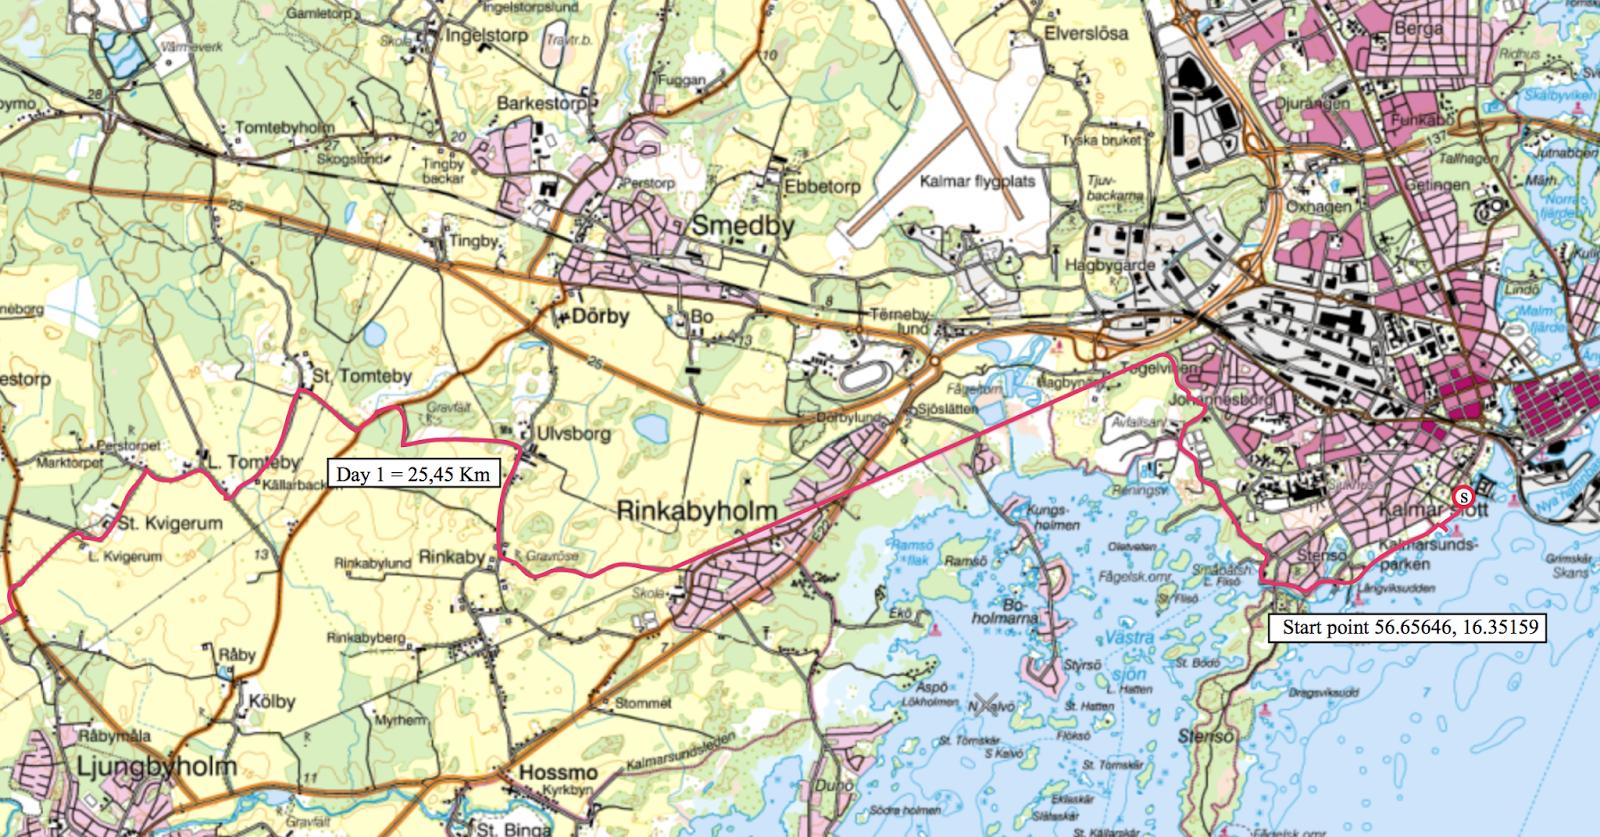 Coast To Coast Sweden Maps And Trail Description For Sale - Sweden map 2015